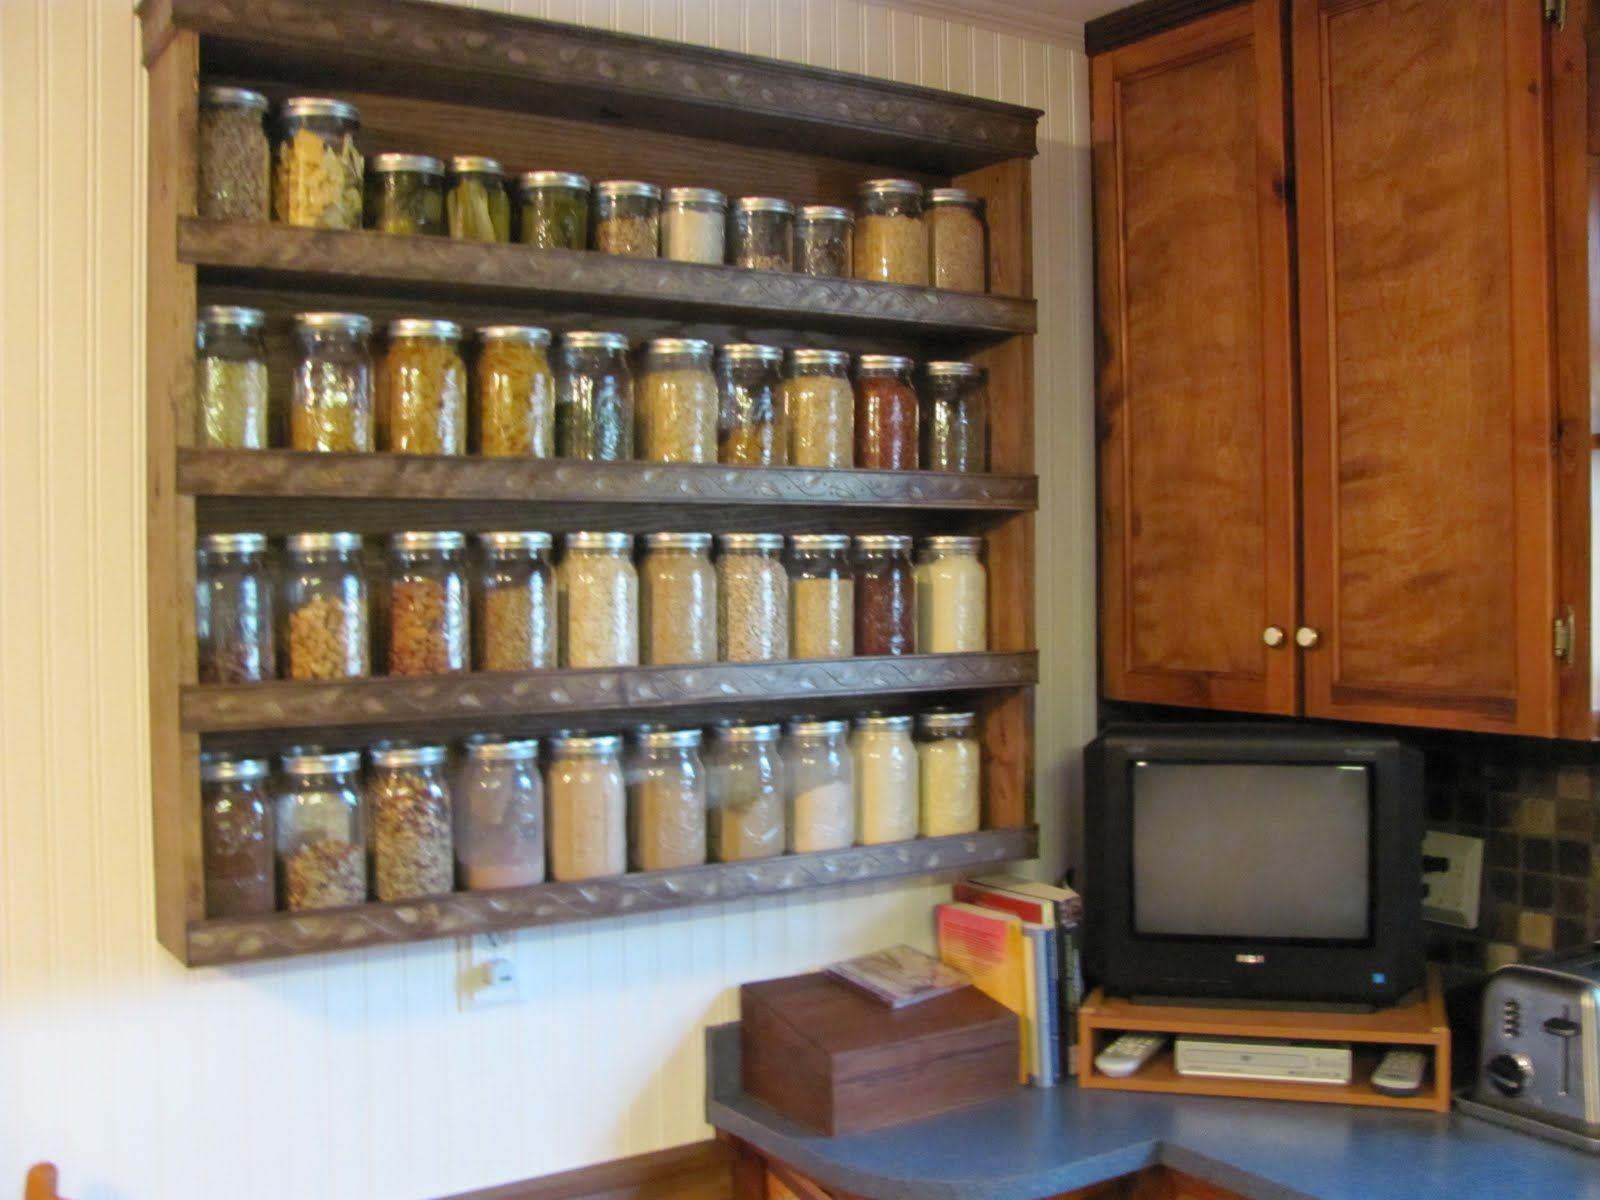 best storage organizer kitchen of awesome organizers cabinet image ideas house